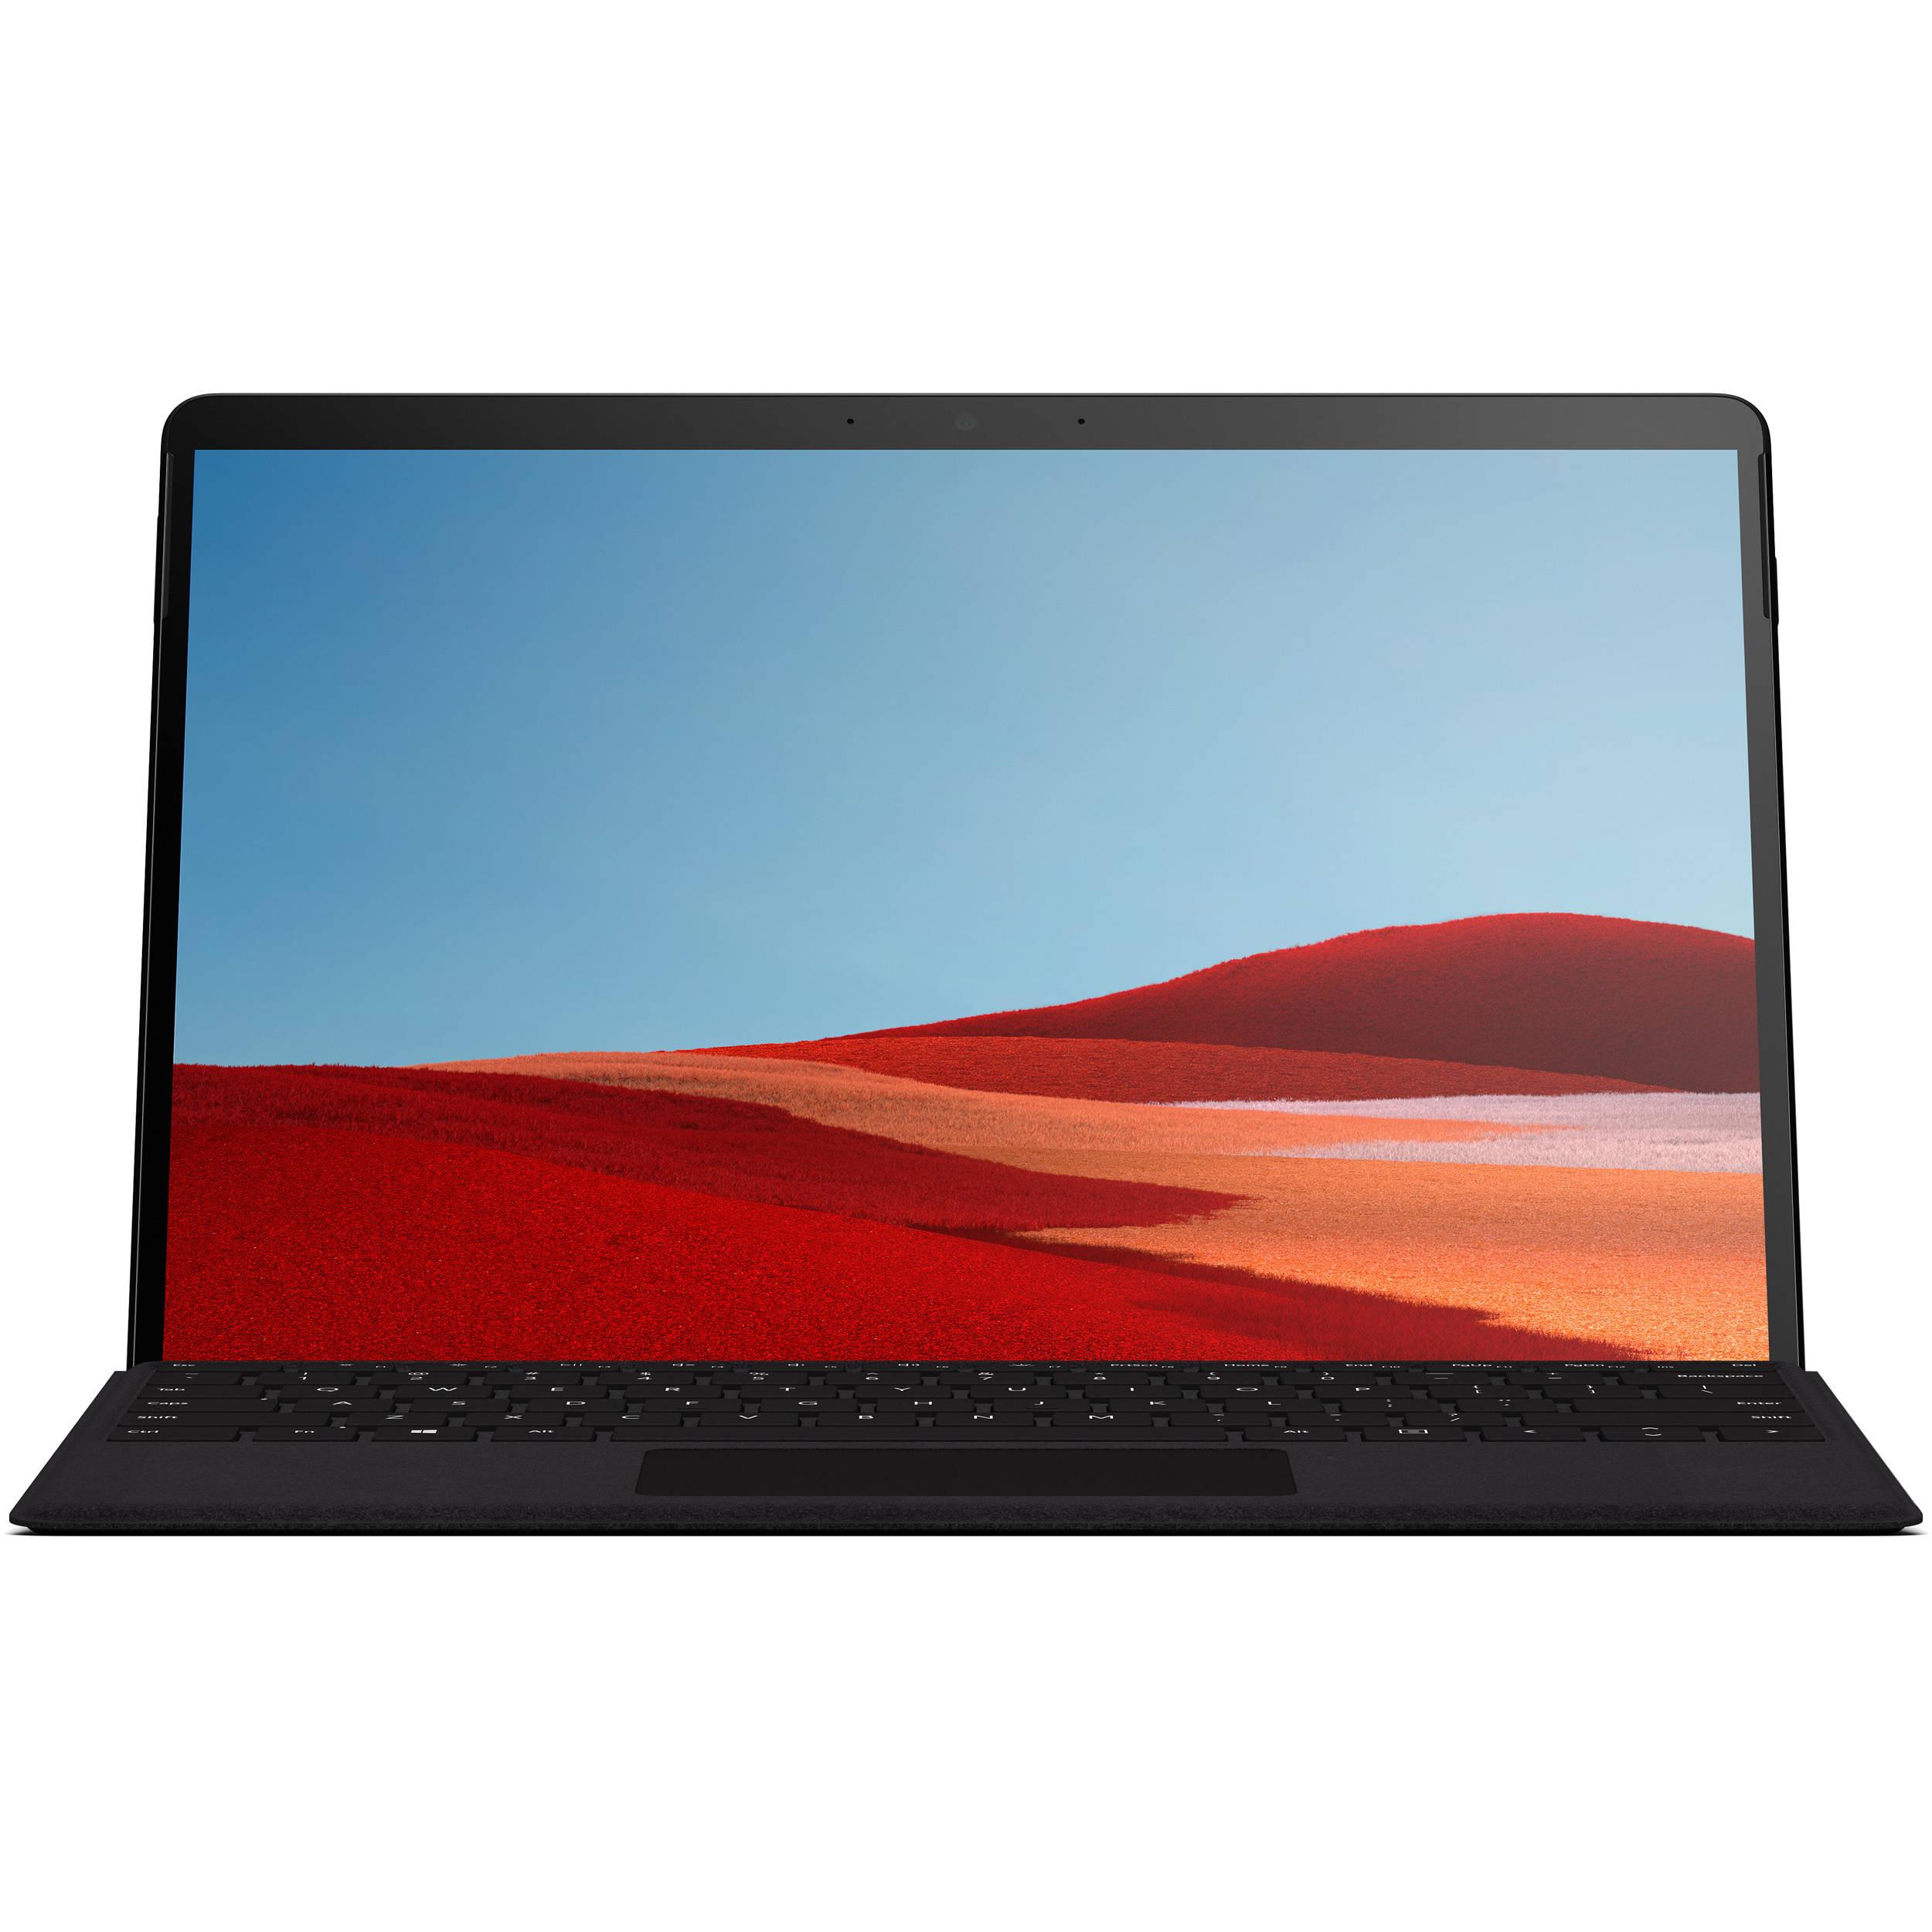 تبلت مایکروسافت مدل Surface Pro X LTE - D ظرفیت 512 گیگابایت به همراه کیبورد Black Type Cover